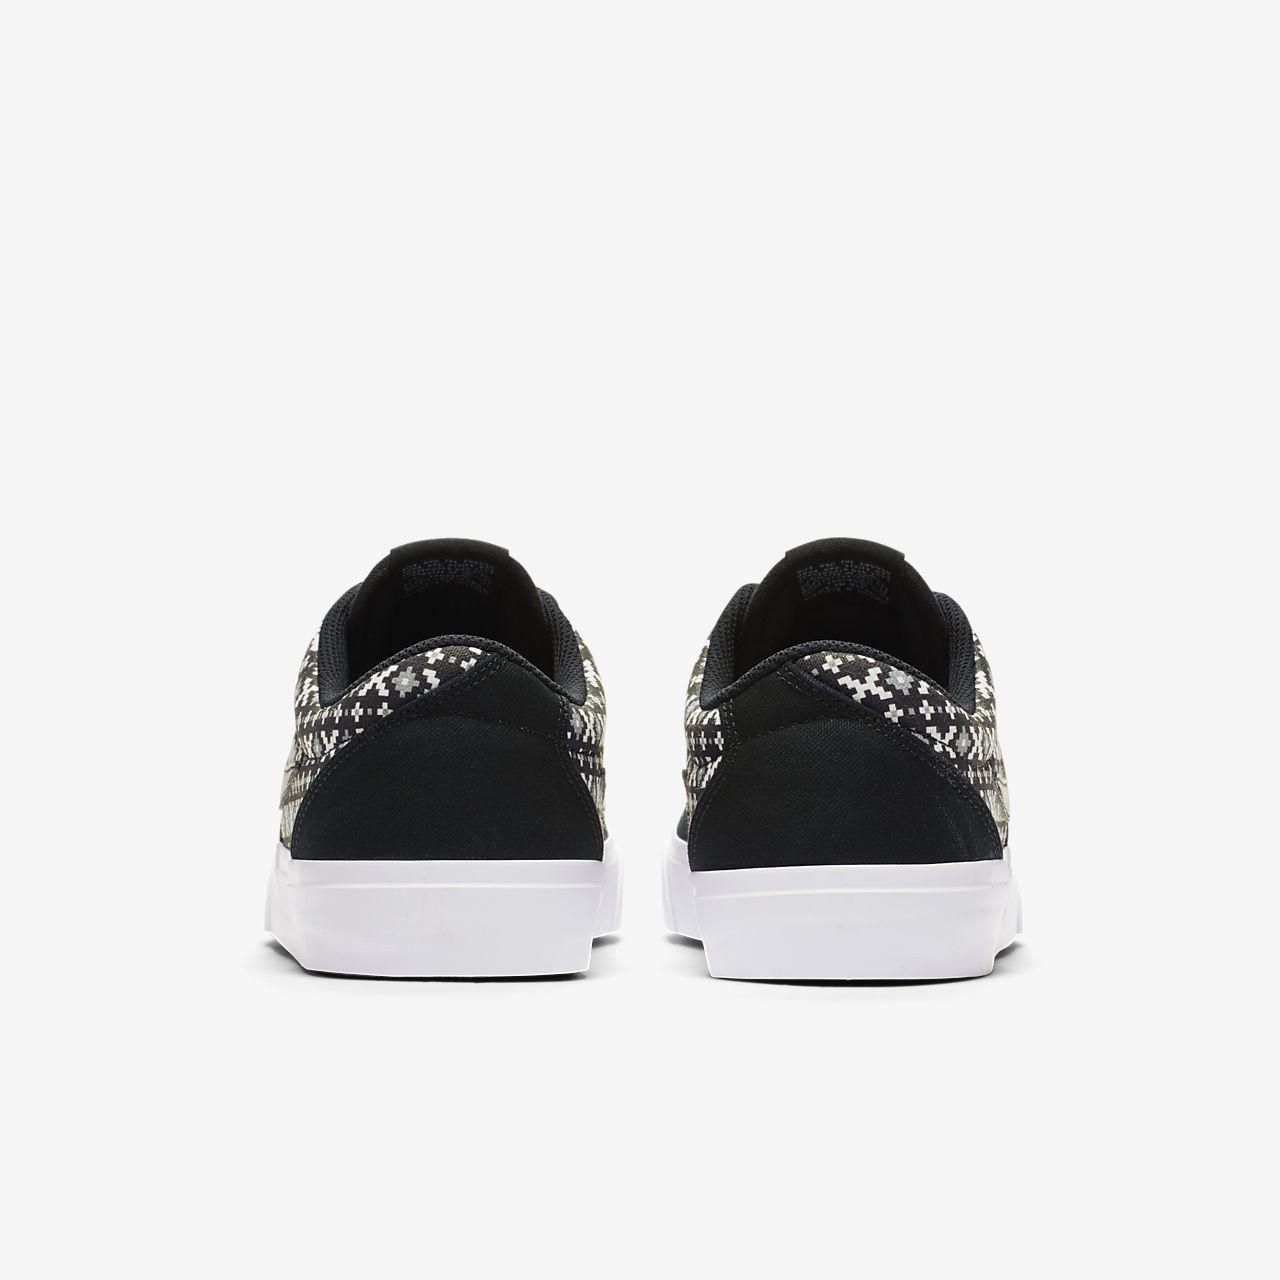 Scarpa da skateboard Nike SB Charge Premium